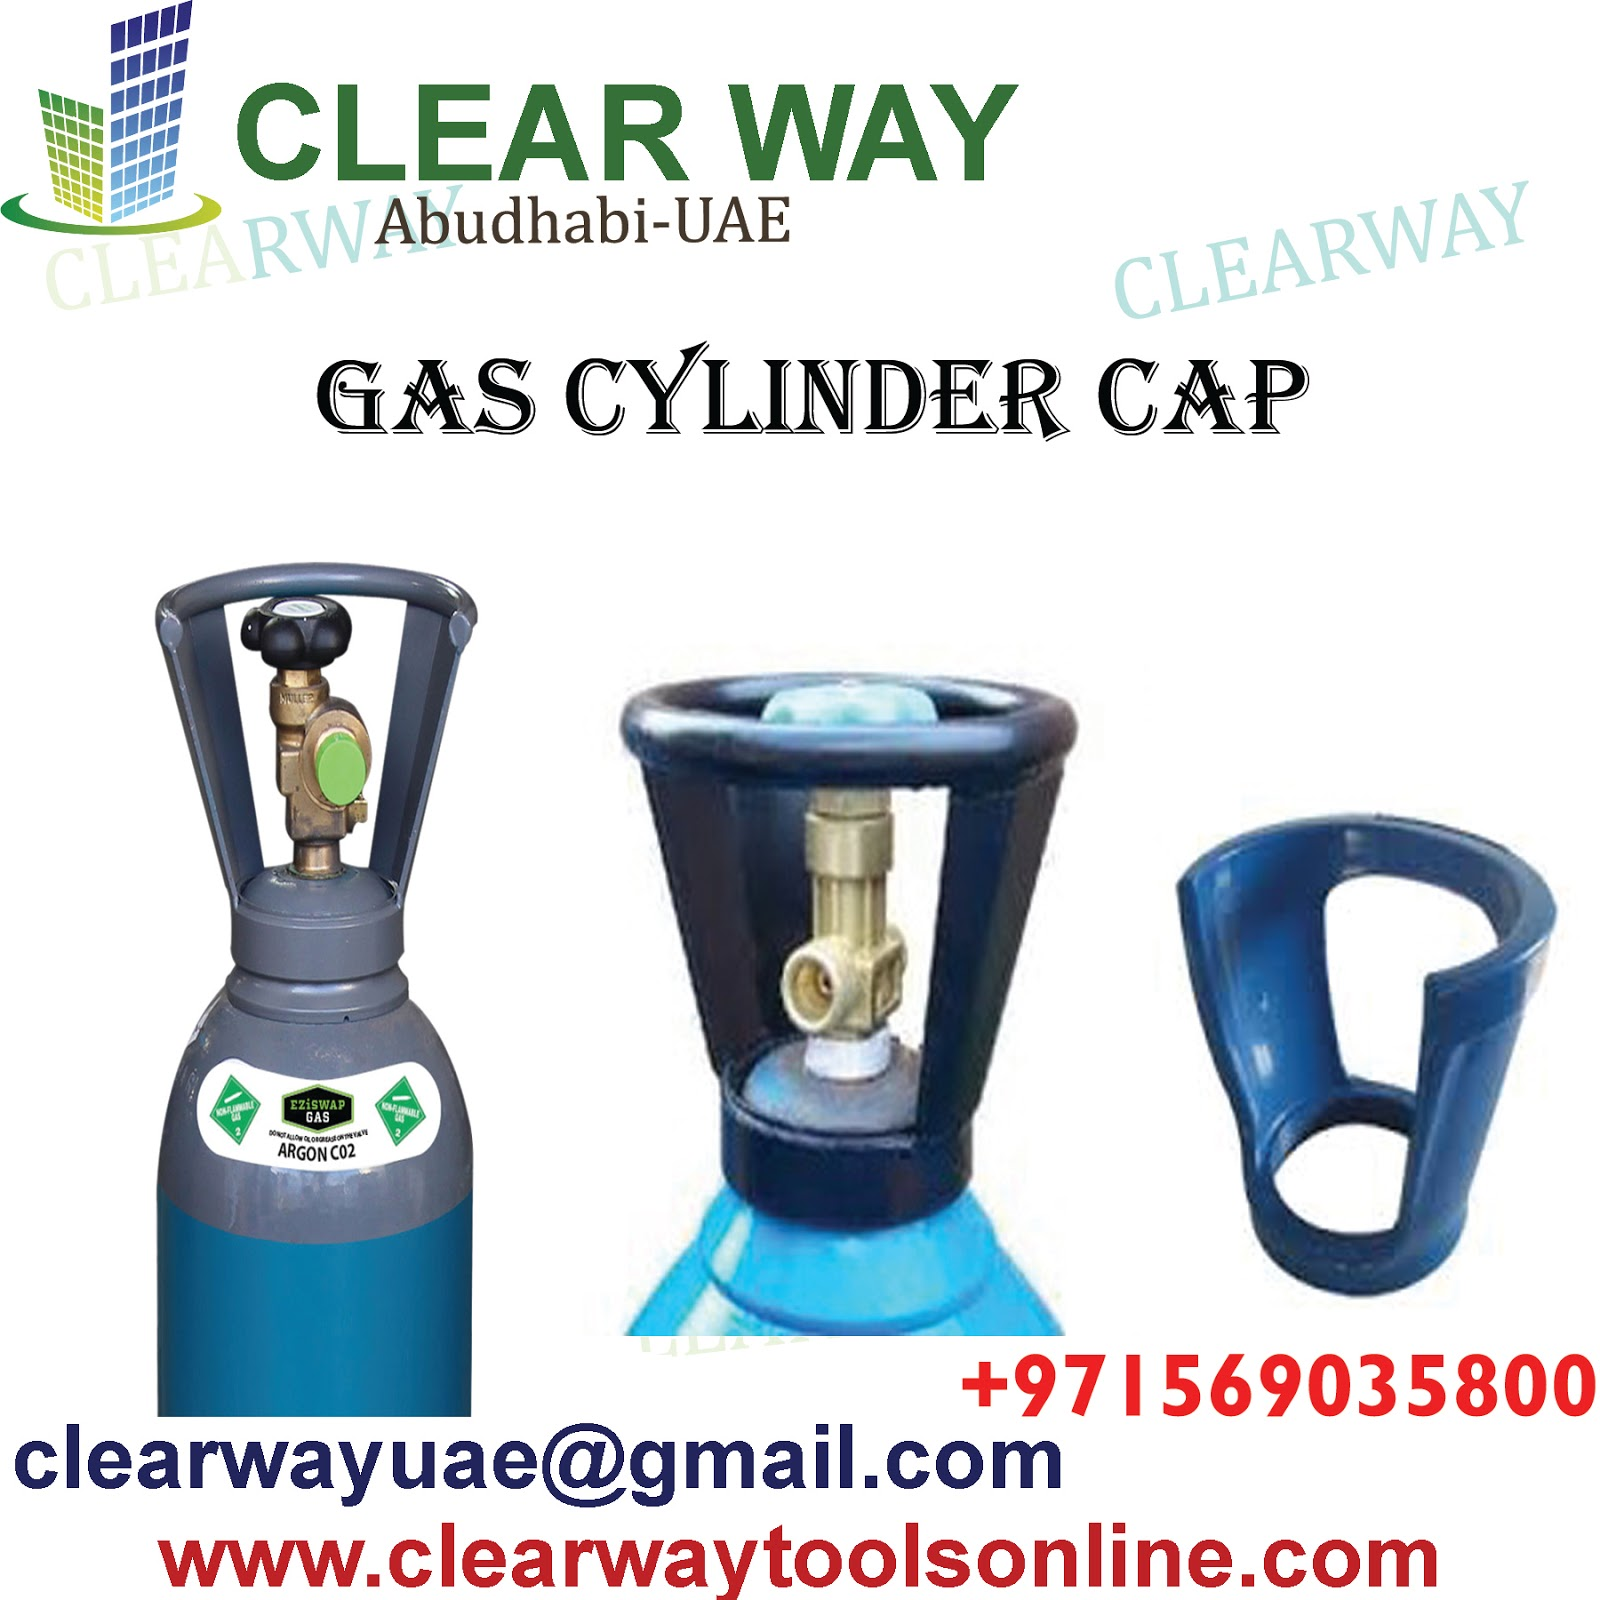 CLEARWAY: GAS CYLINDER SAFETY CAP DEALER IN MUSSAFAH , ABUDHABI ,UAE